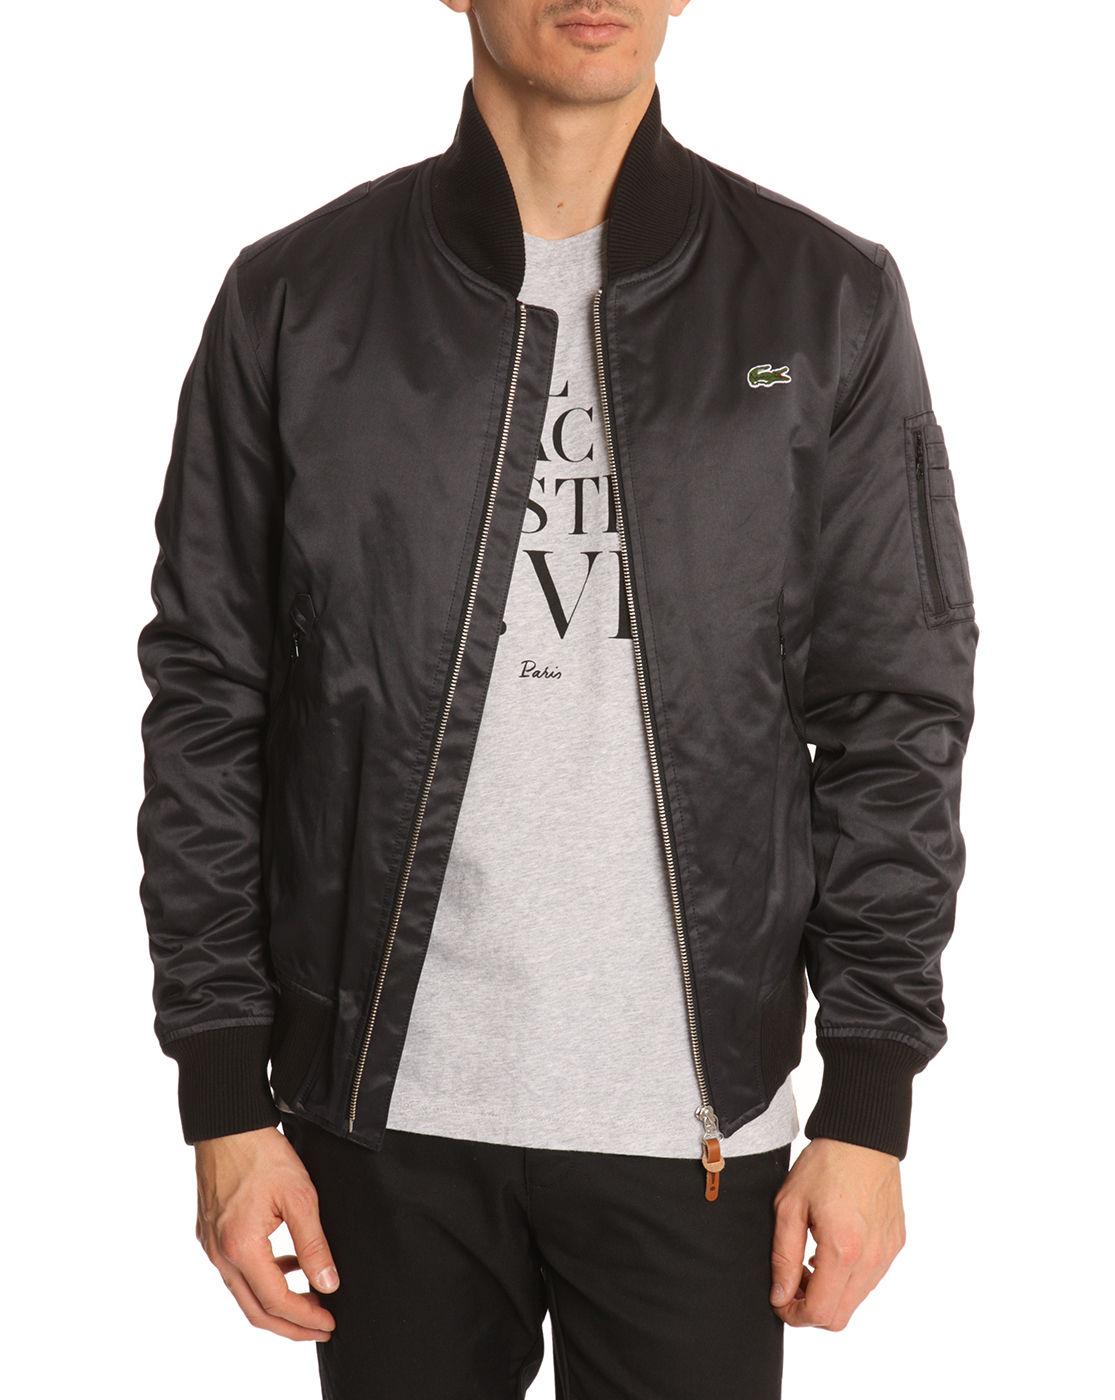 lacoste l ive black nylon zipped jacket in black for men lyst. Black Bedroom Furniture Sets. Home Design Ideas